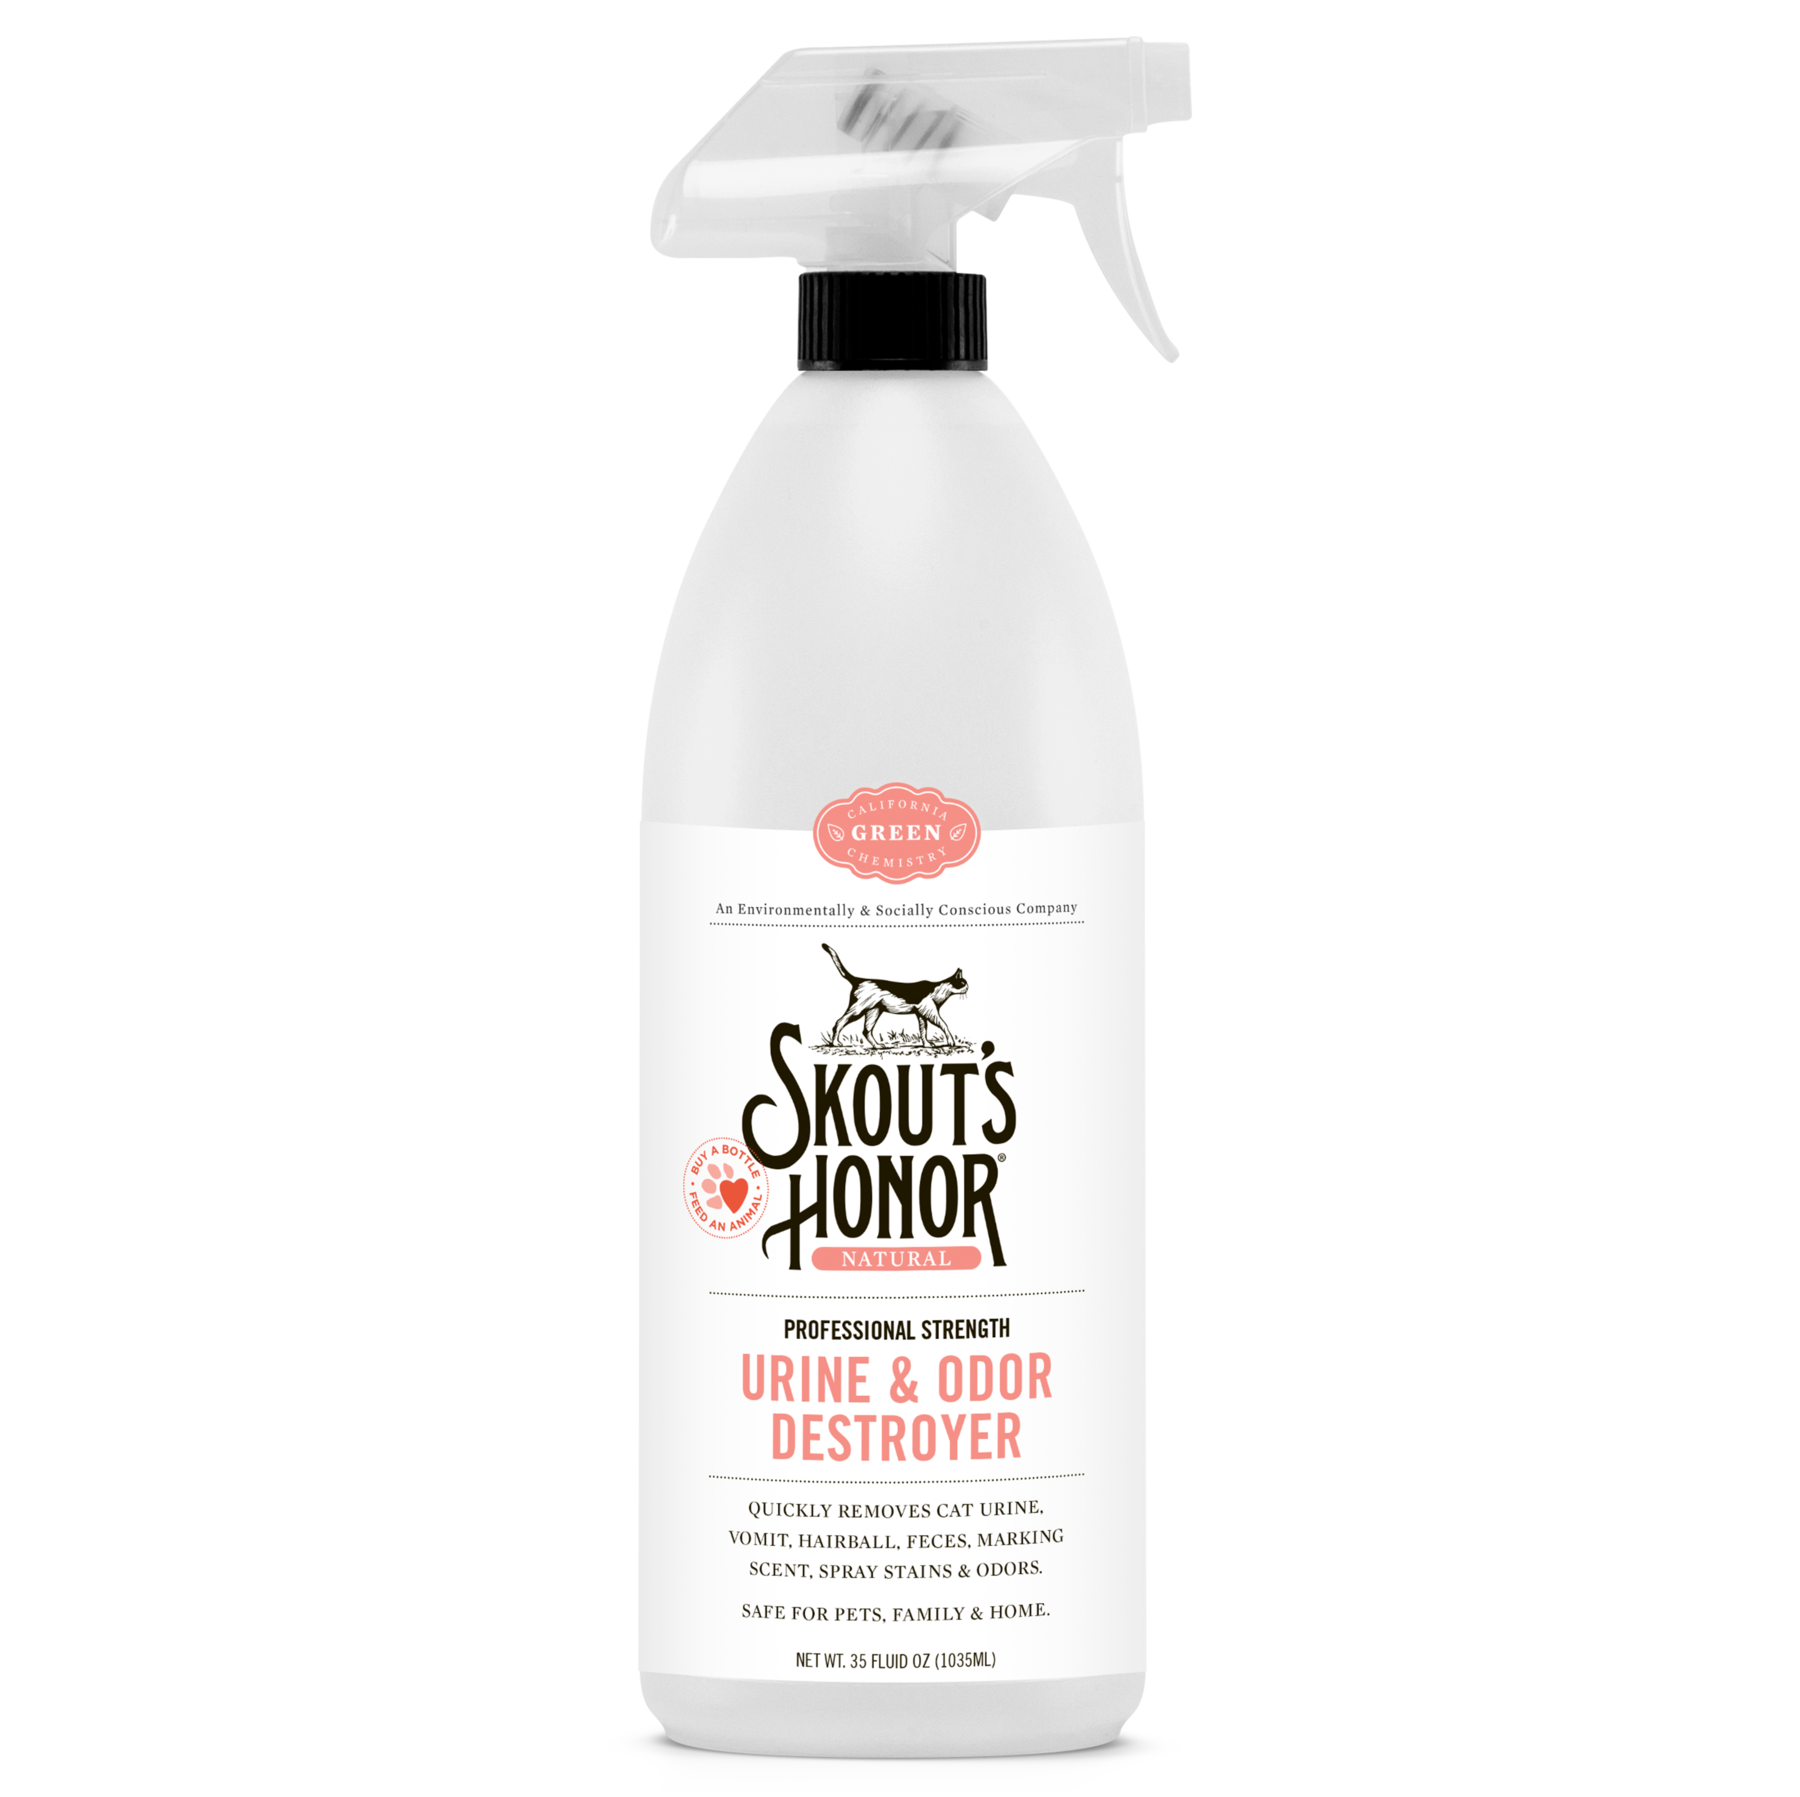 Skout's Honor Feline Urine & Odor Destroyer Cleaning Spray